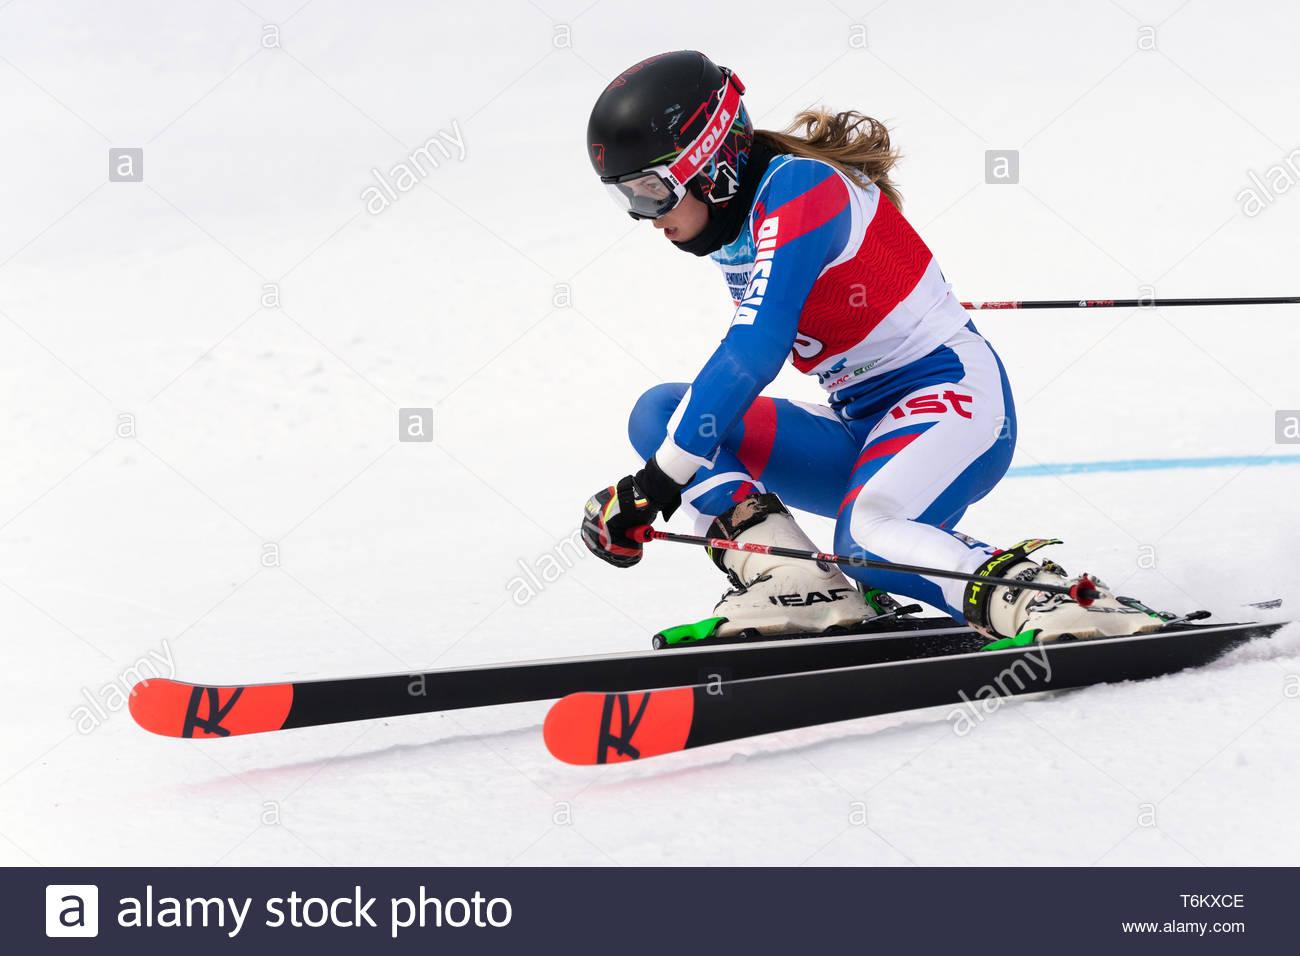 KAMCHATKA, RUSSIA - APRIL 2, 2019: Mountain skier Ulyana Lendya (Kamchatka Peninsula) skiing down mount slope. International Ski Federation Championsh - Stock Image